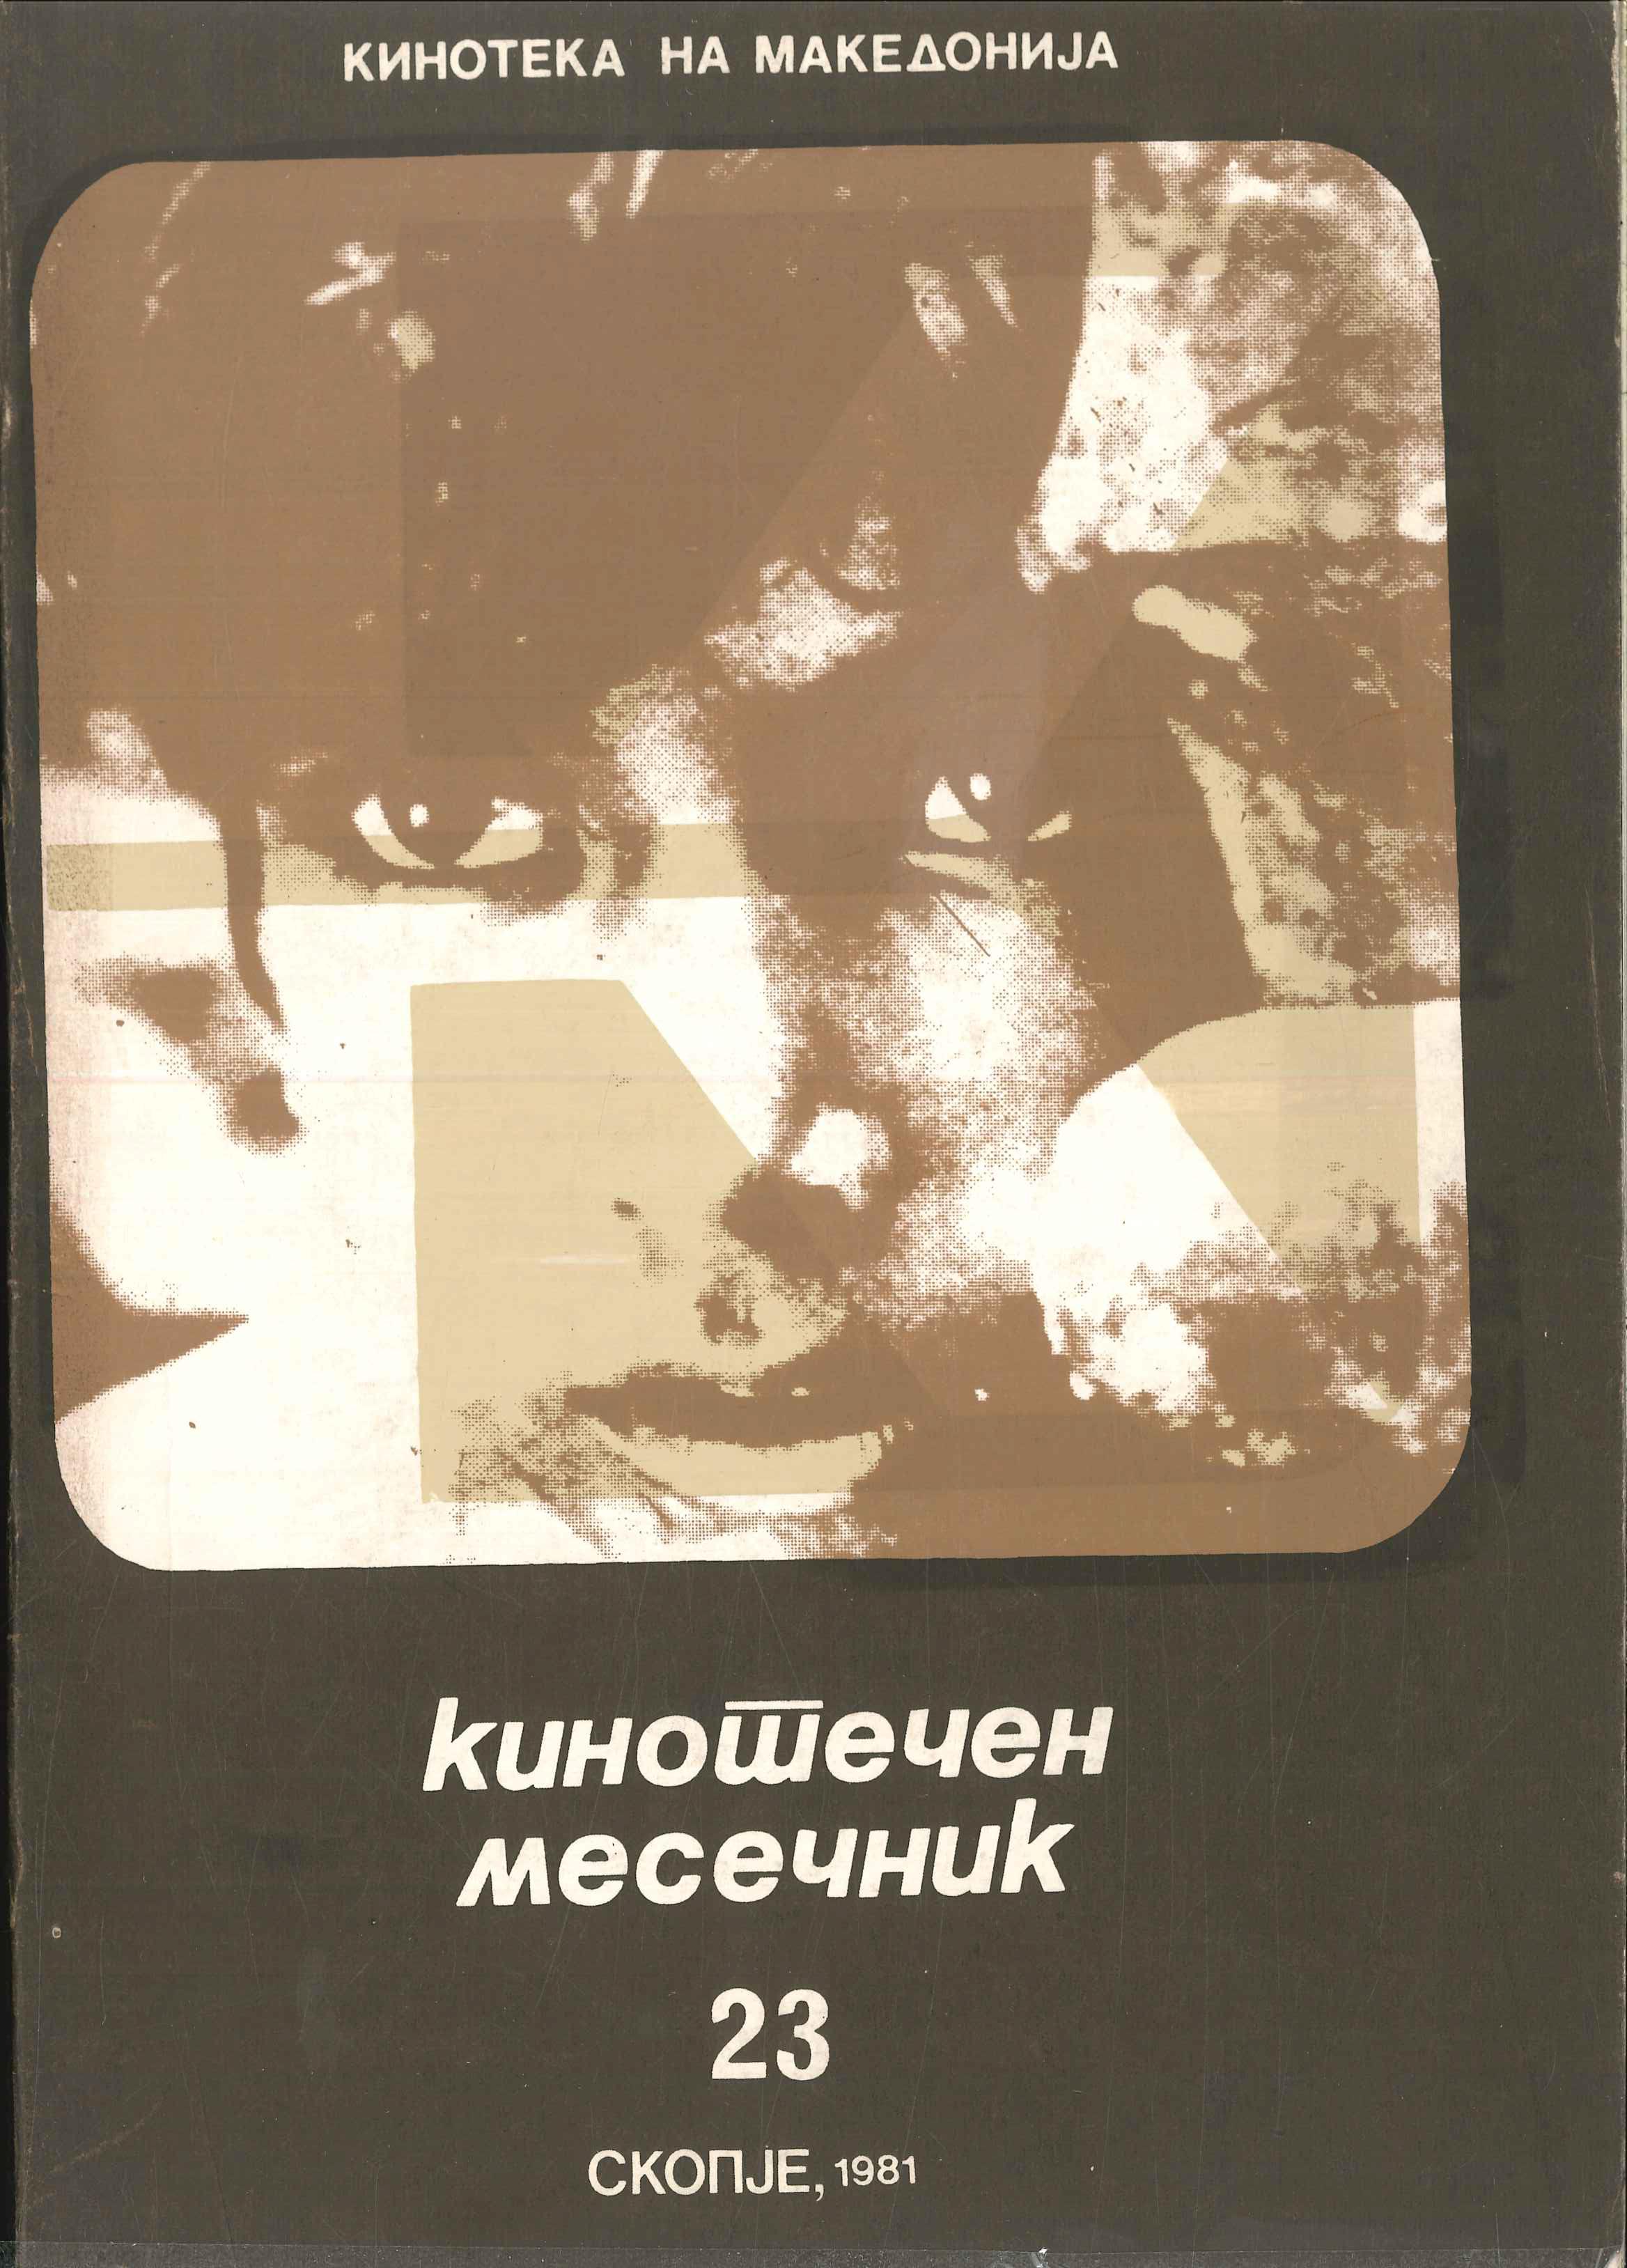 Кинотечен месечник бр. 23